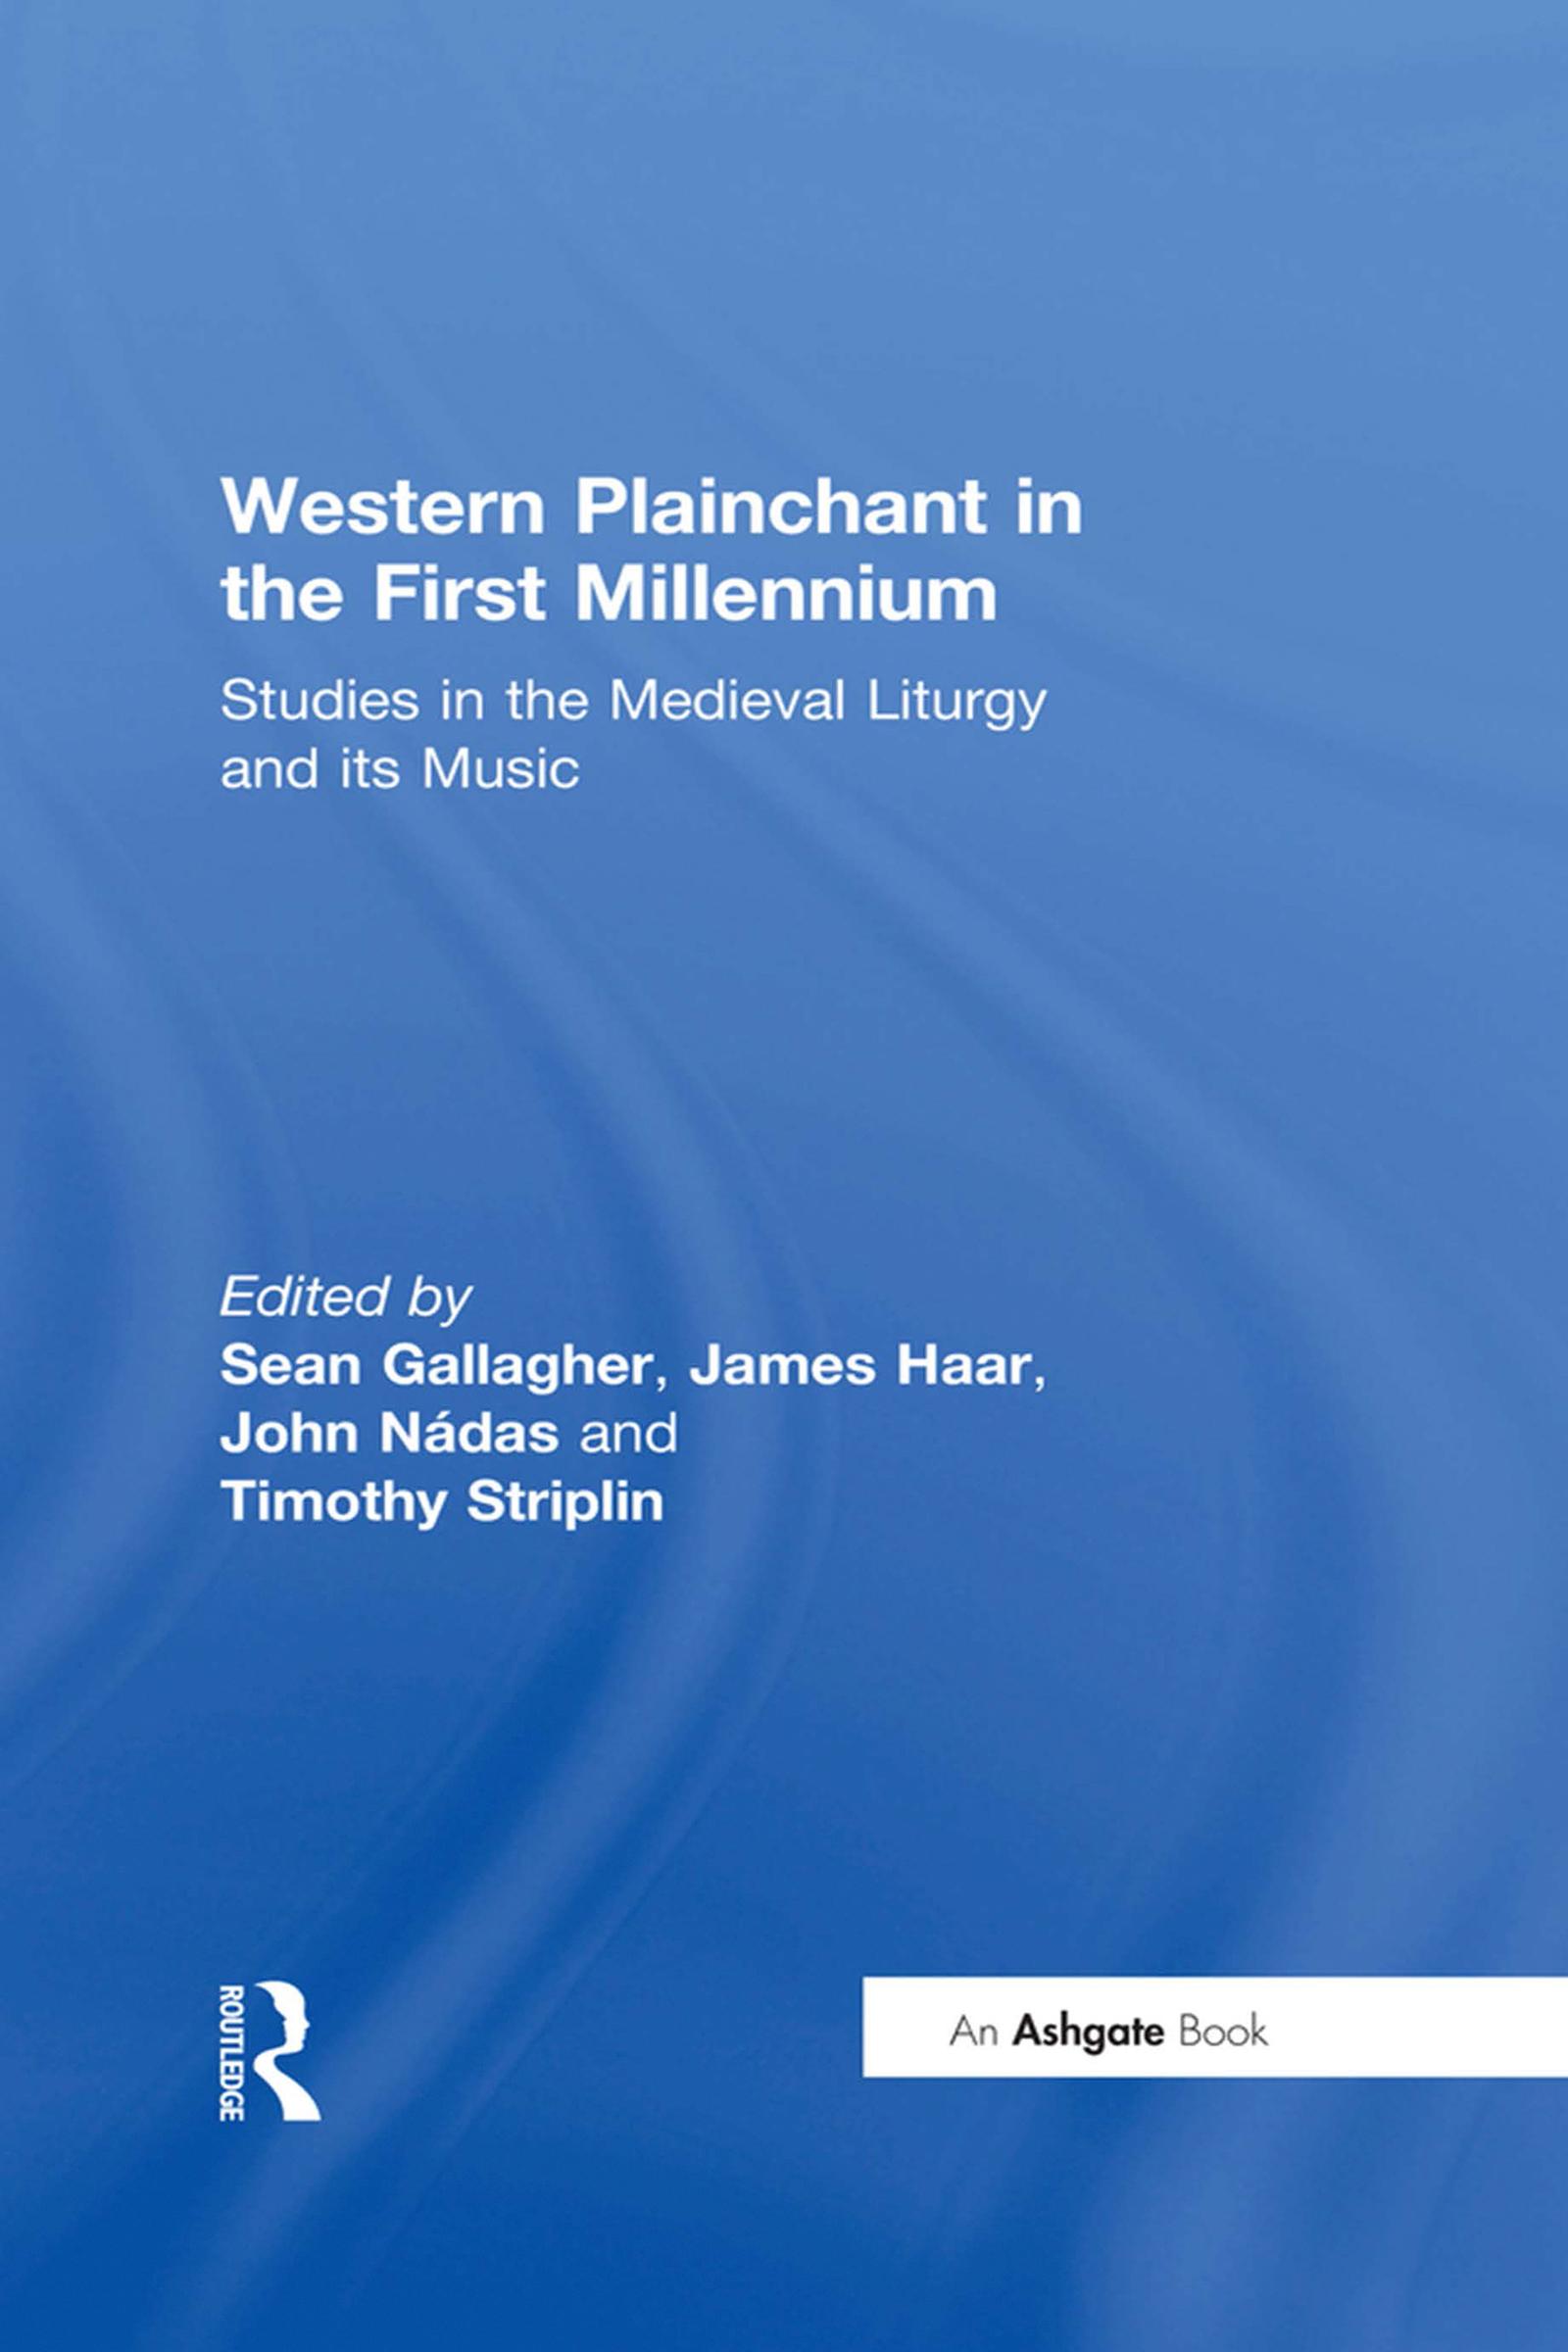 Western Plainchant in the First Millennium